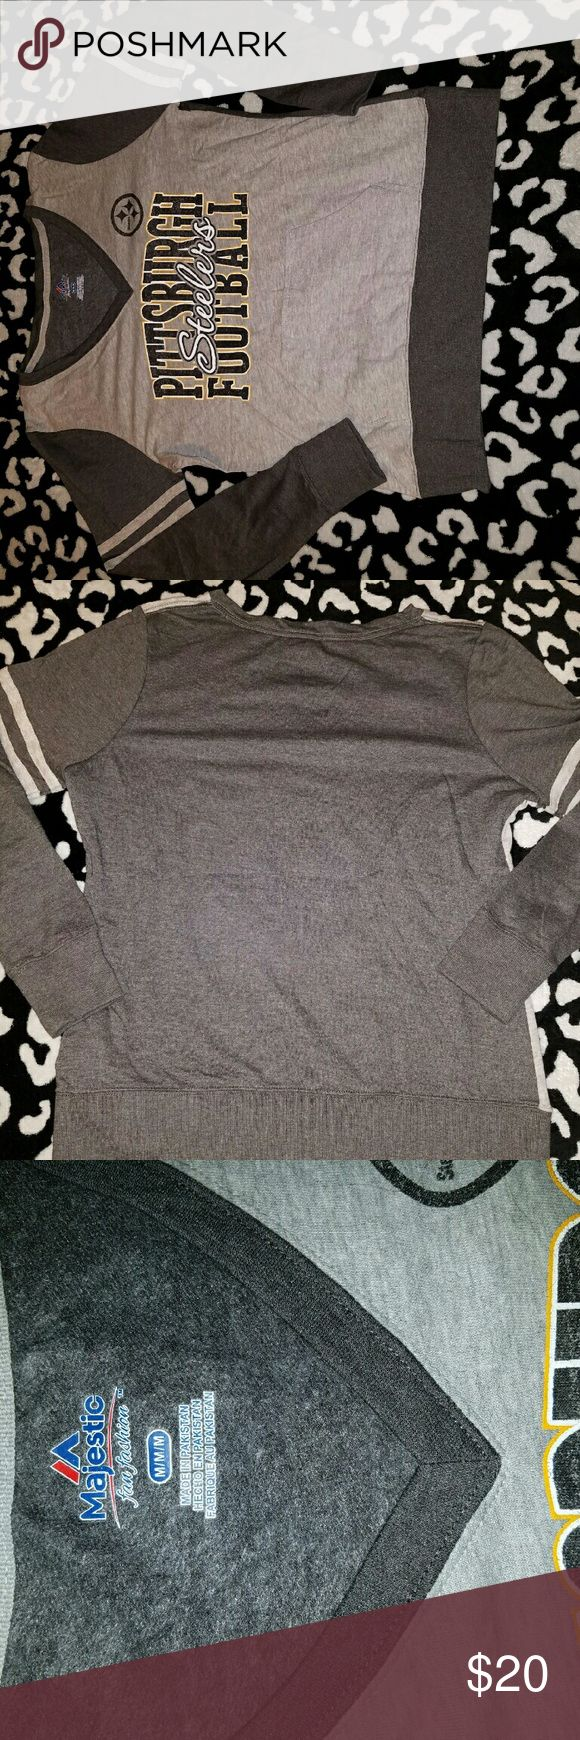 NWOT Pittsburgh Steelera sweatshirt. Lightweight Women's gray Pittsburgh Steelers sweatshirt with front pocket. V-neck. Size Medium. Majestic Tops